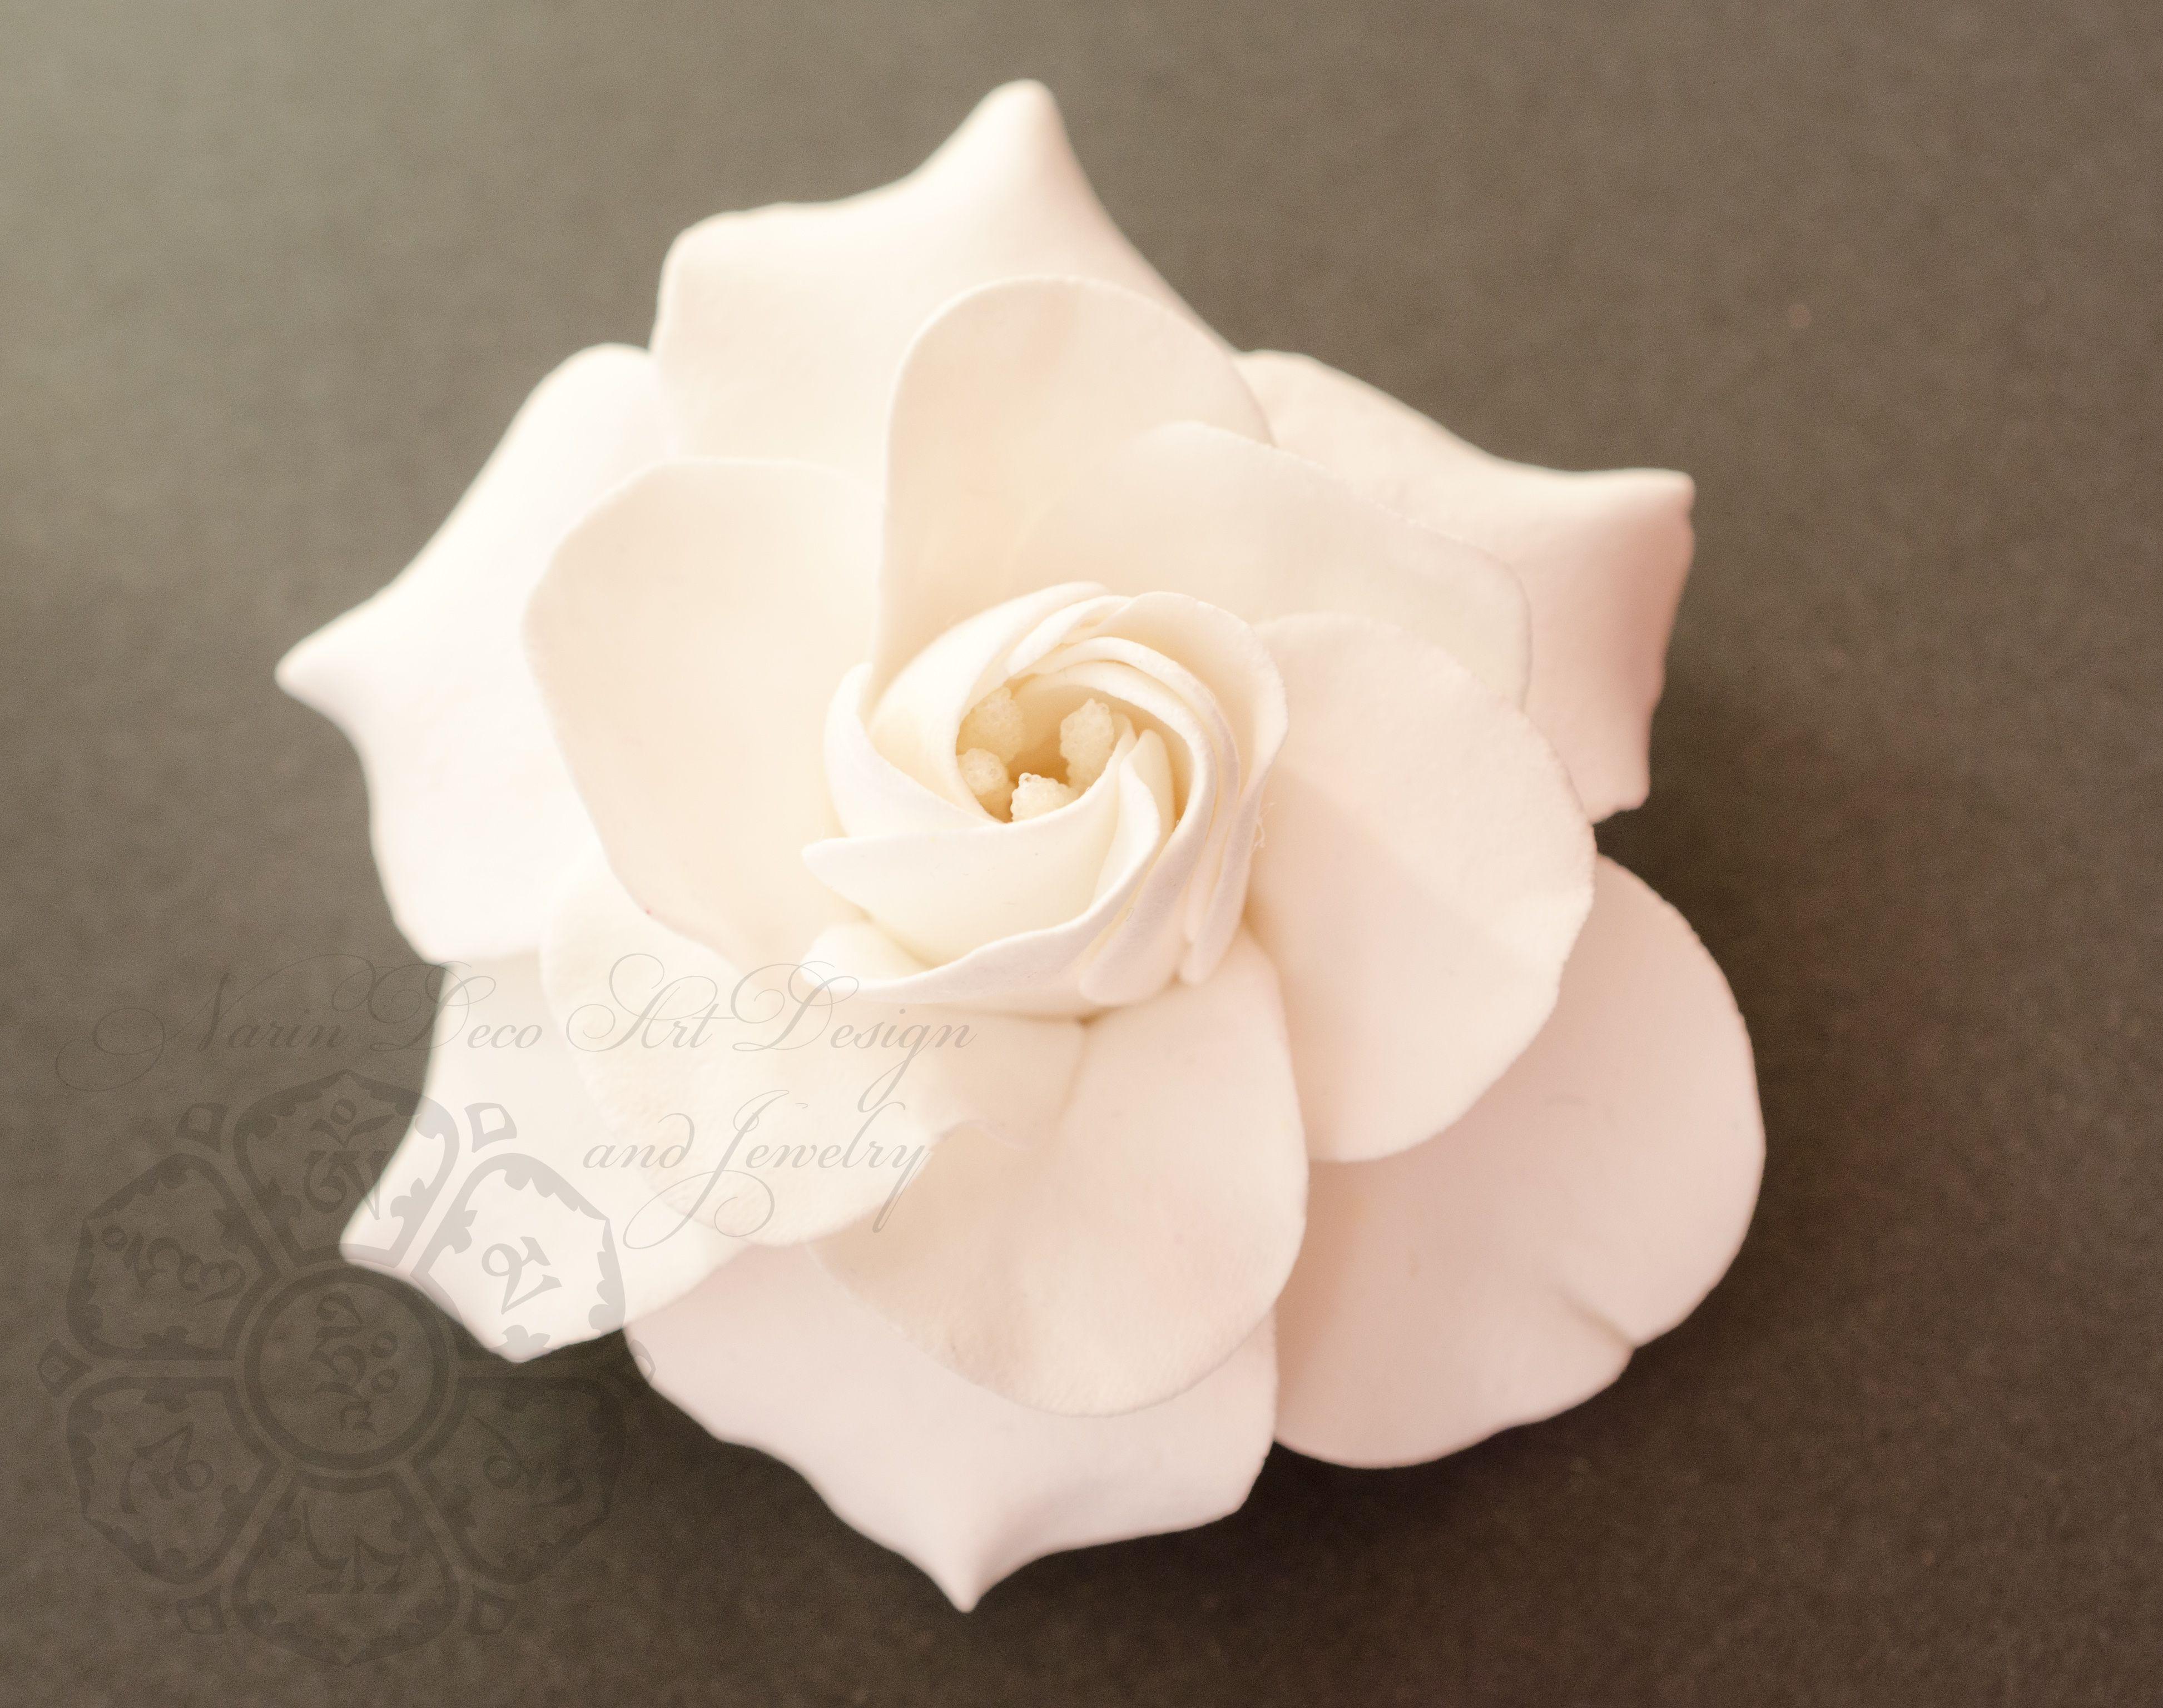 Hair Clip Gardenia Clay Flowers Flower Making Handcraft